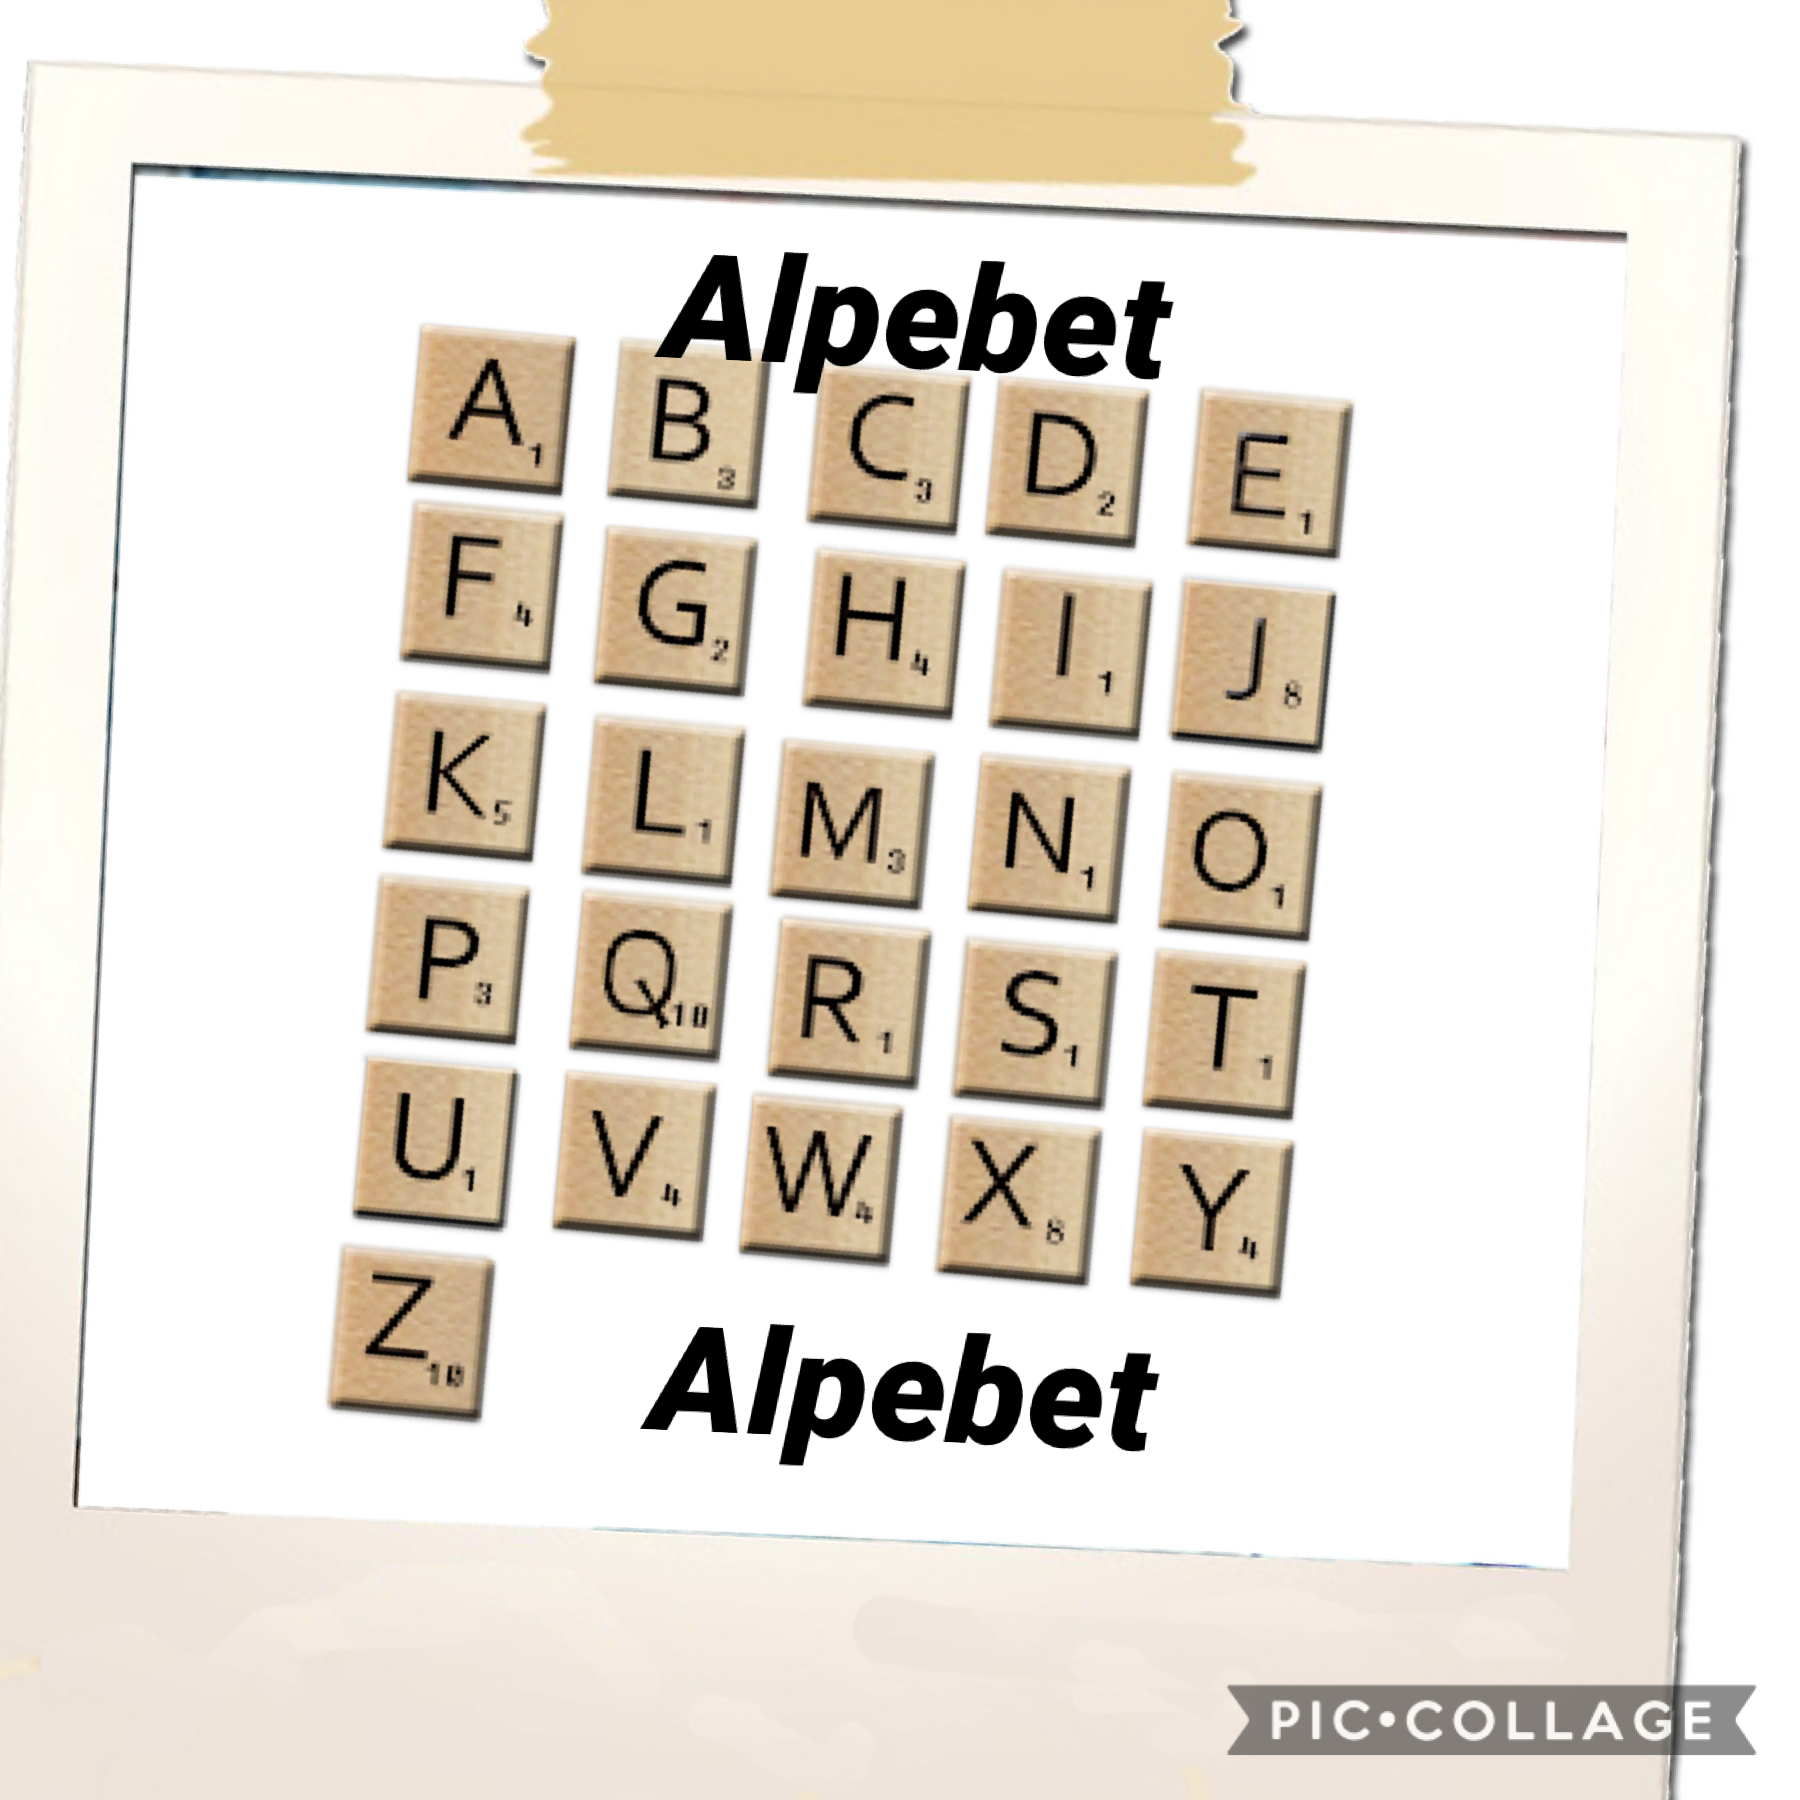 Alpebet to help you guys